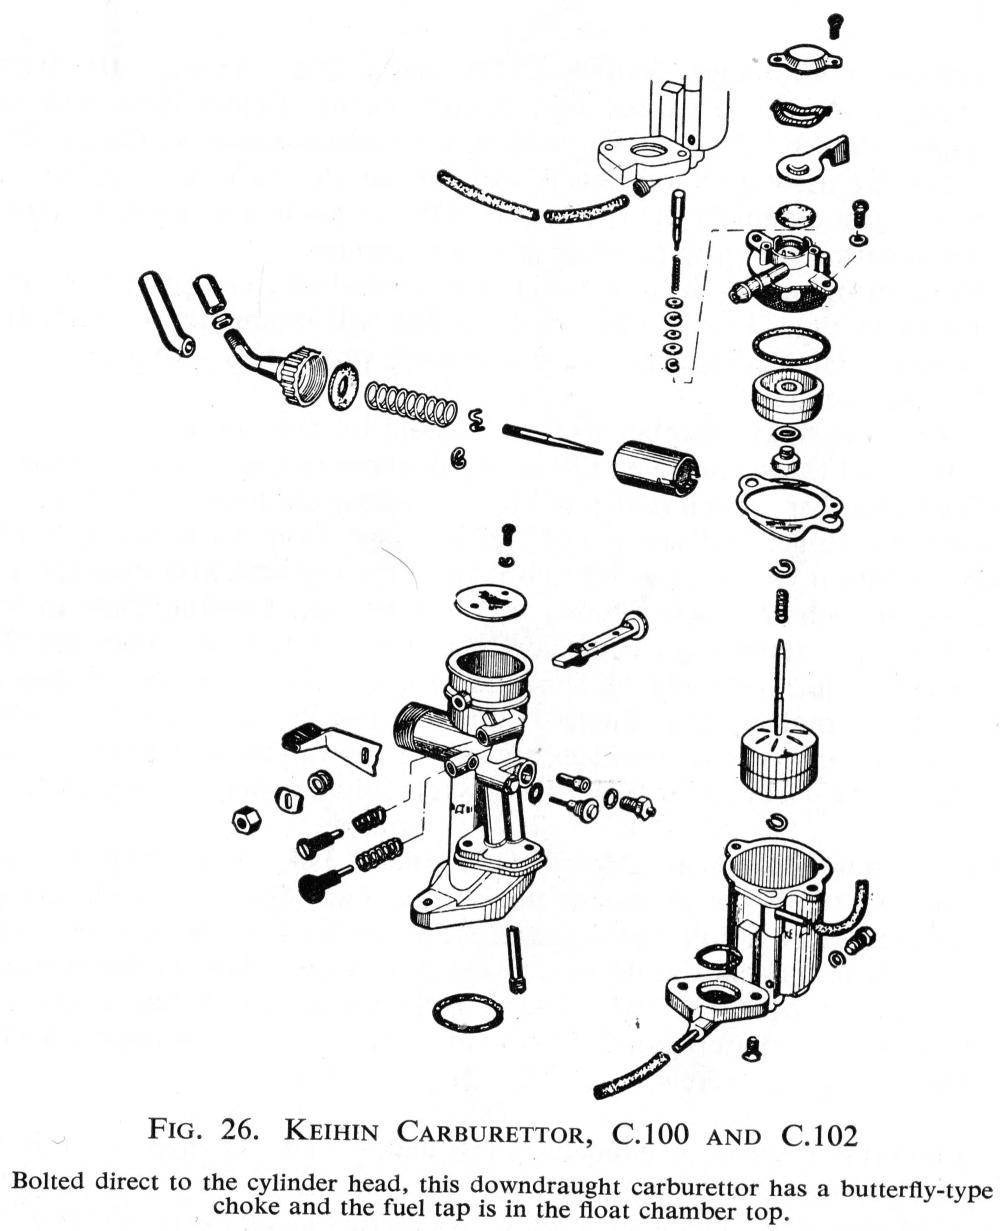 medium resolution of boh keihin carburettor honda c100